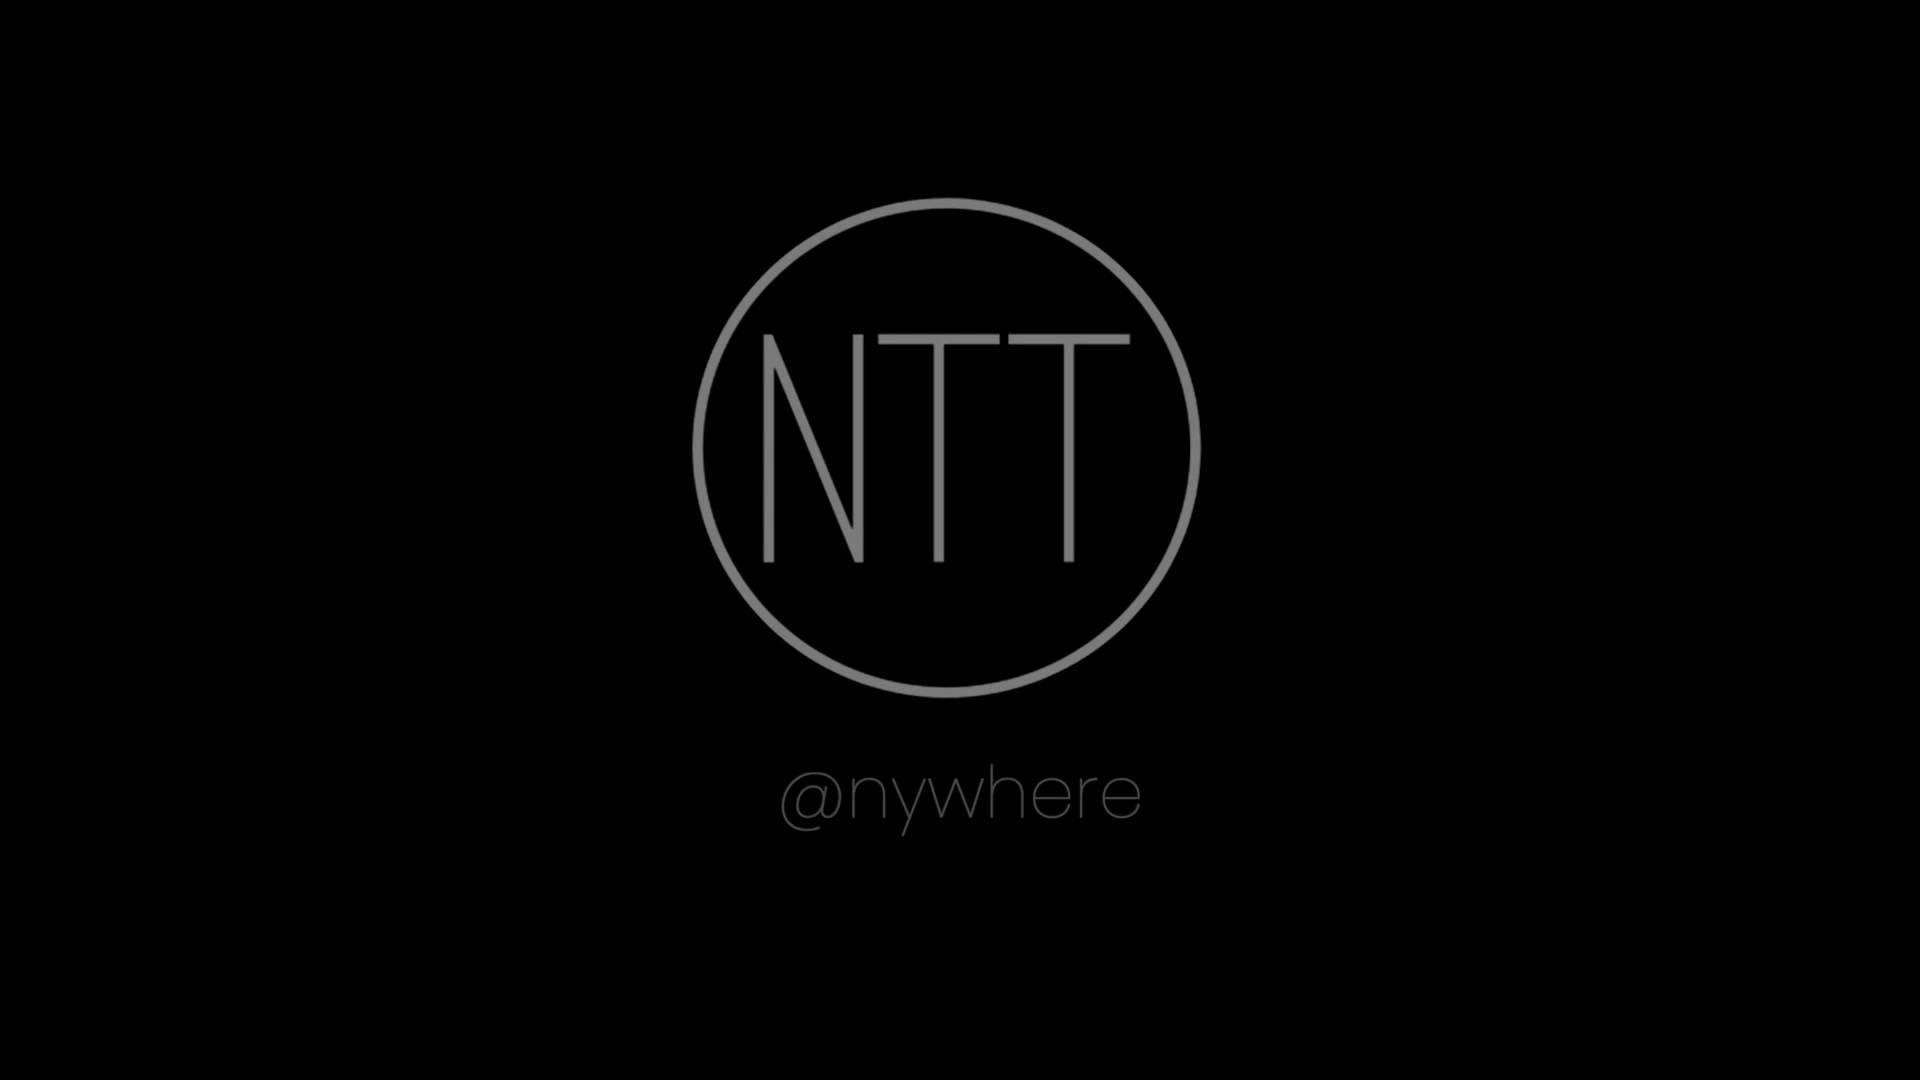 ntt example 1.mp4